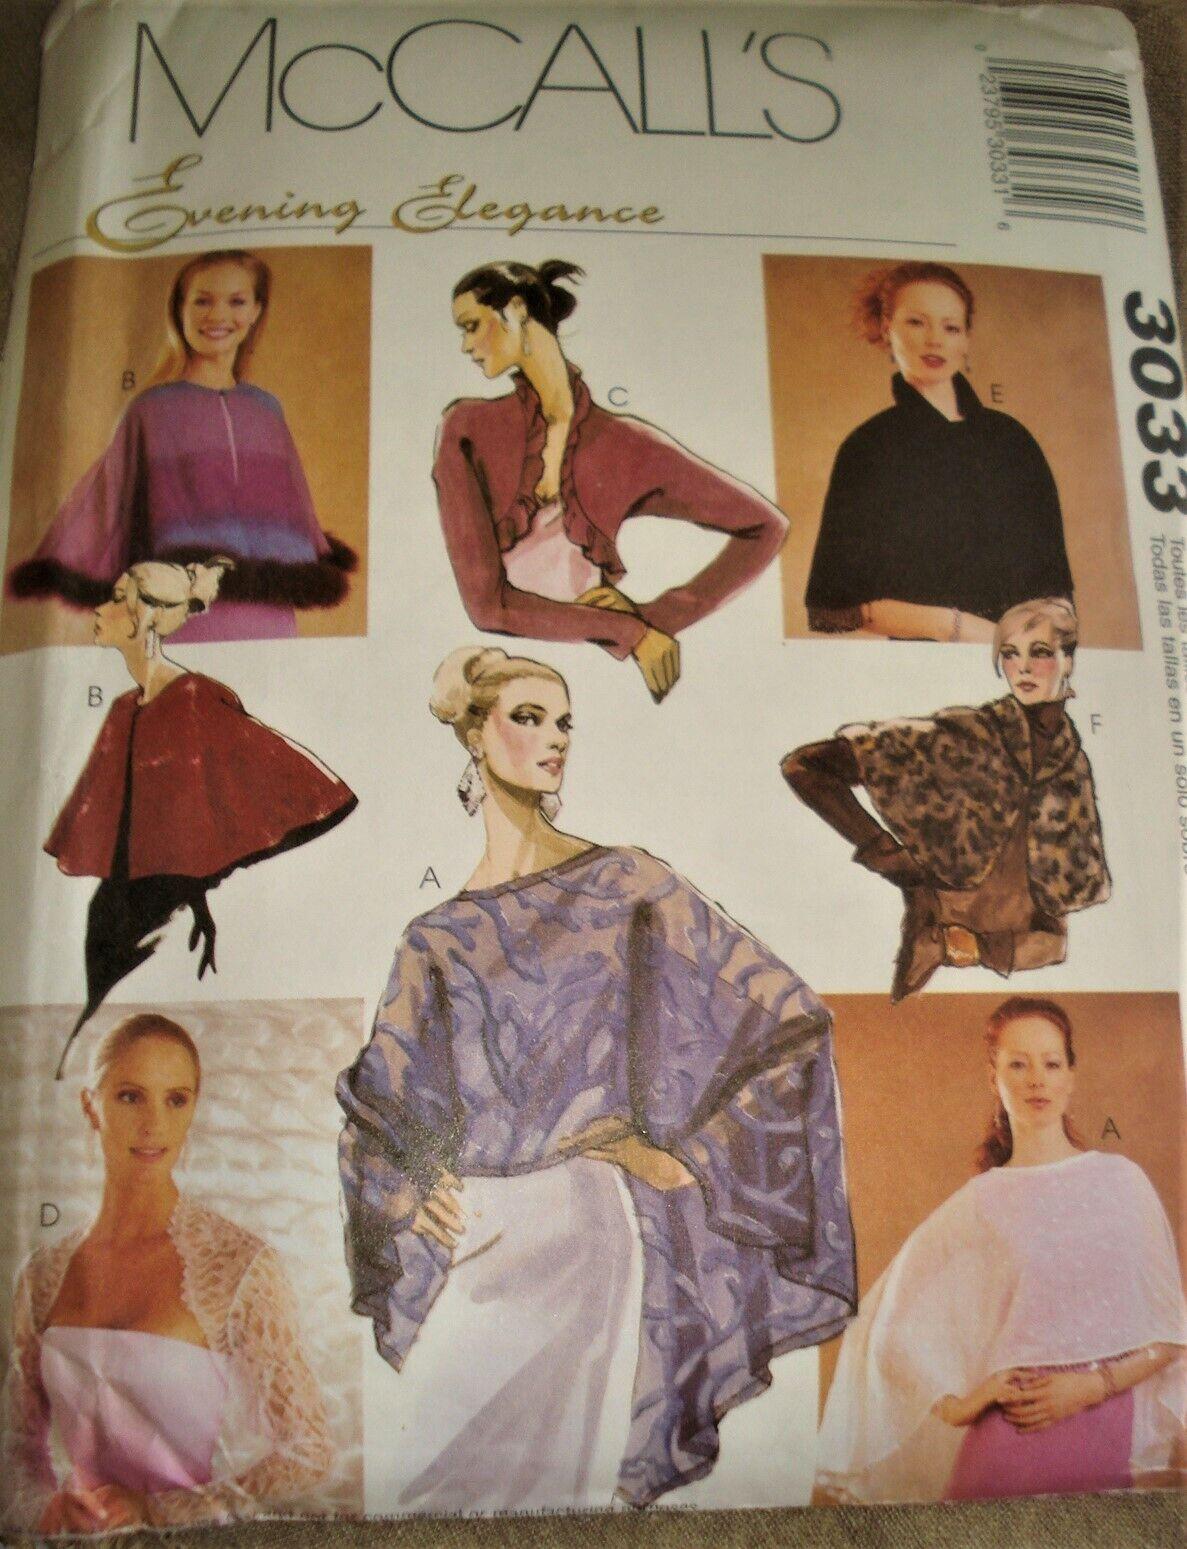 McCall s Sewing Pattern 3033 CAPELETS, SHRUGS BOLEROS Evening Elegance UC - $5.50